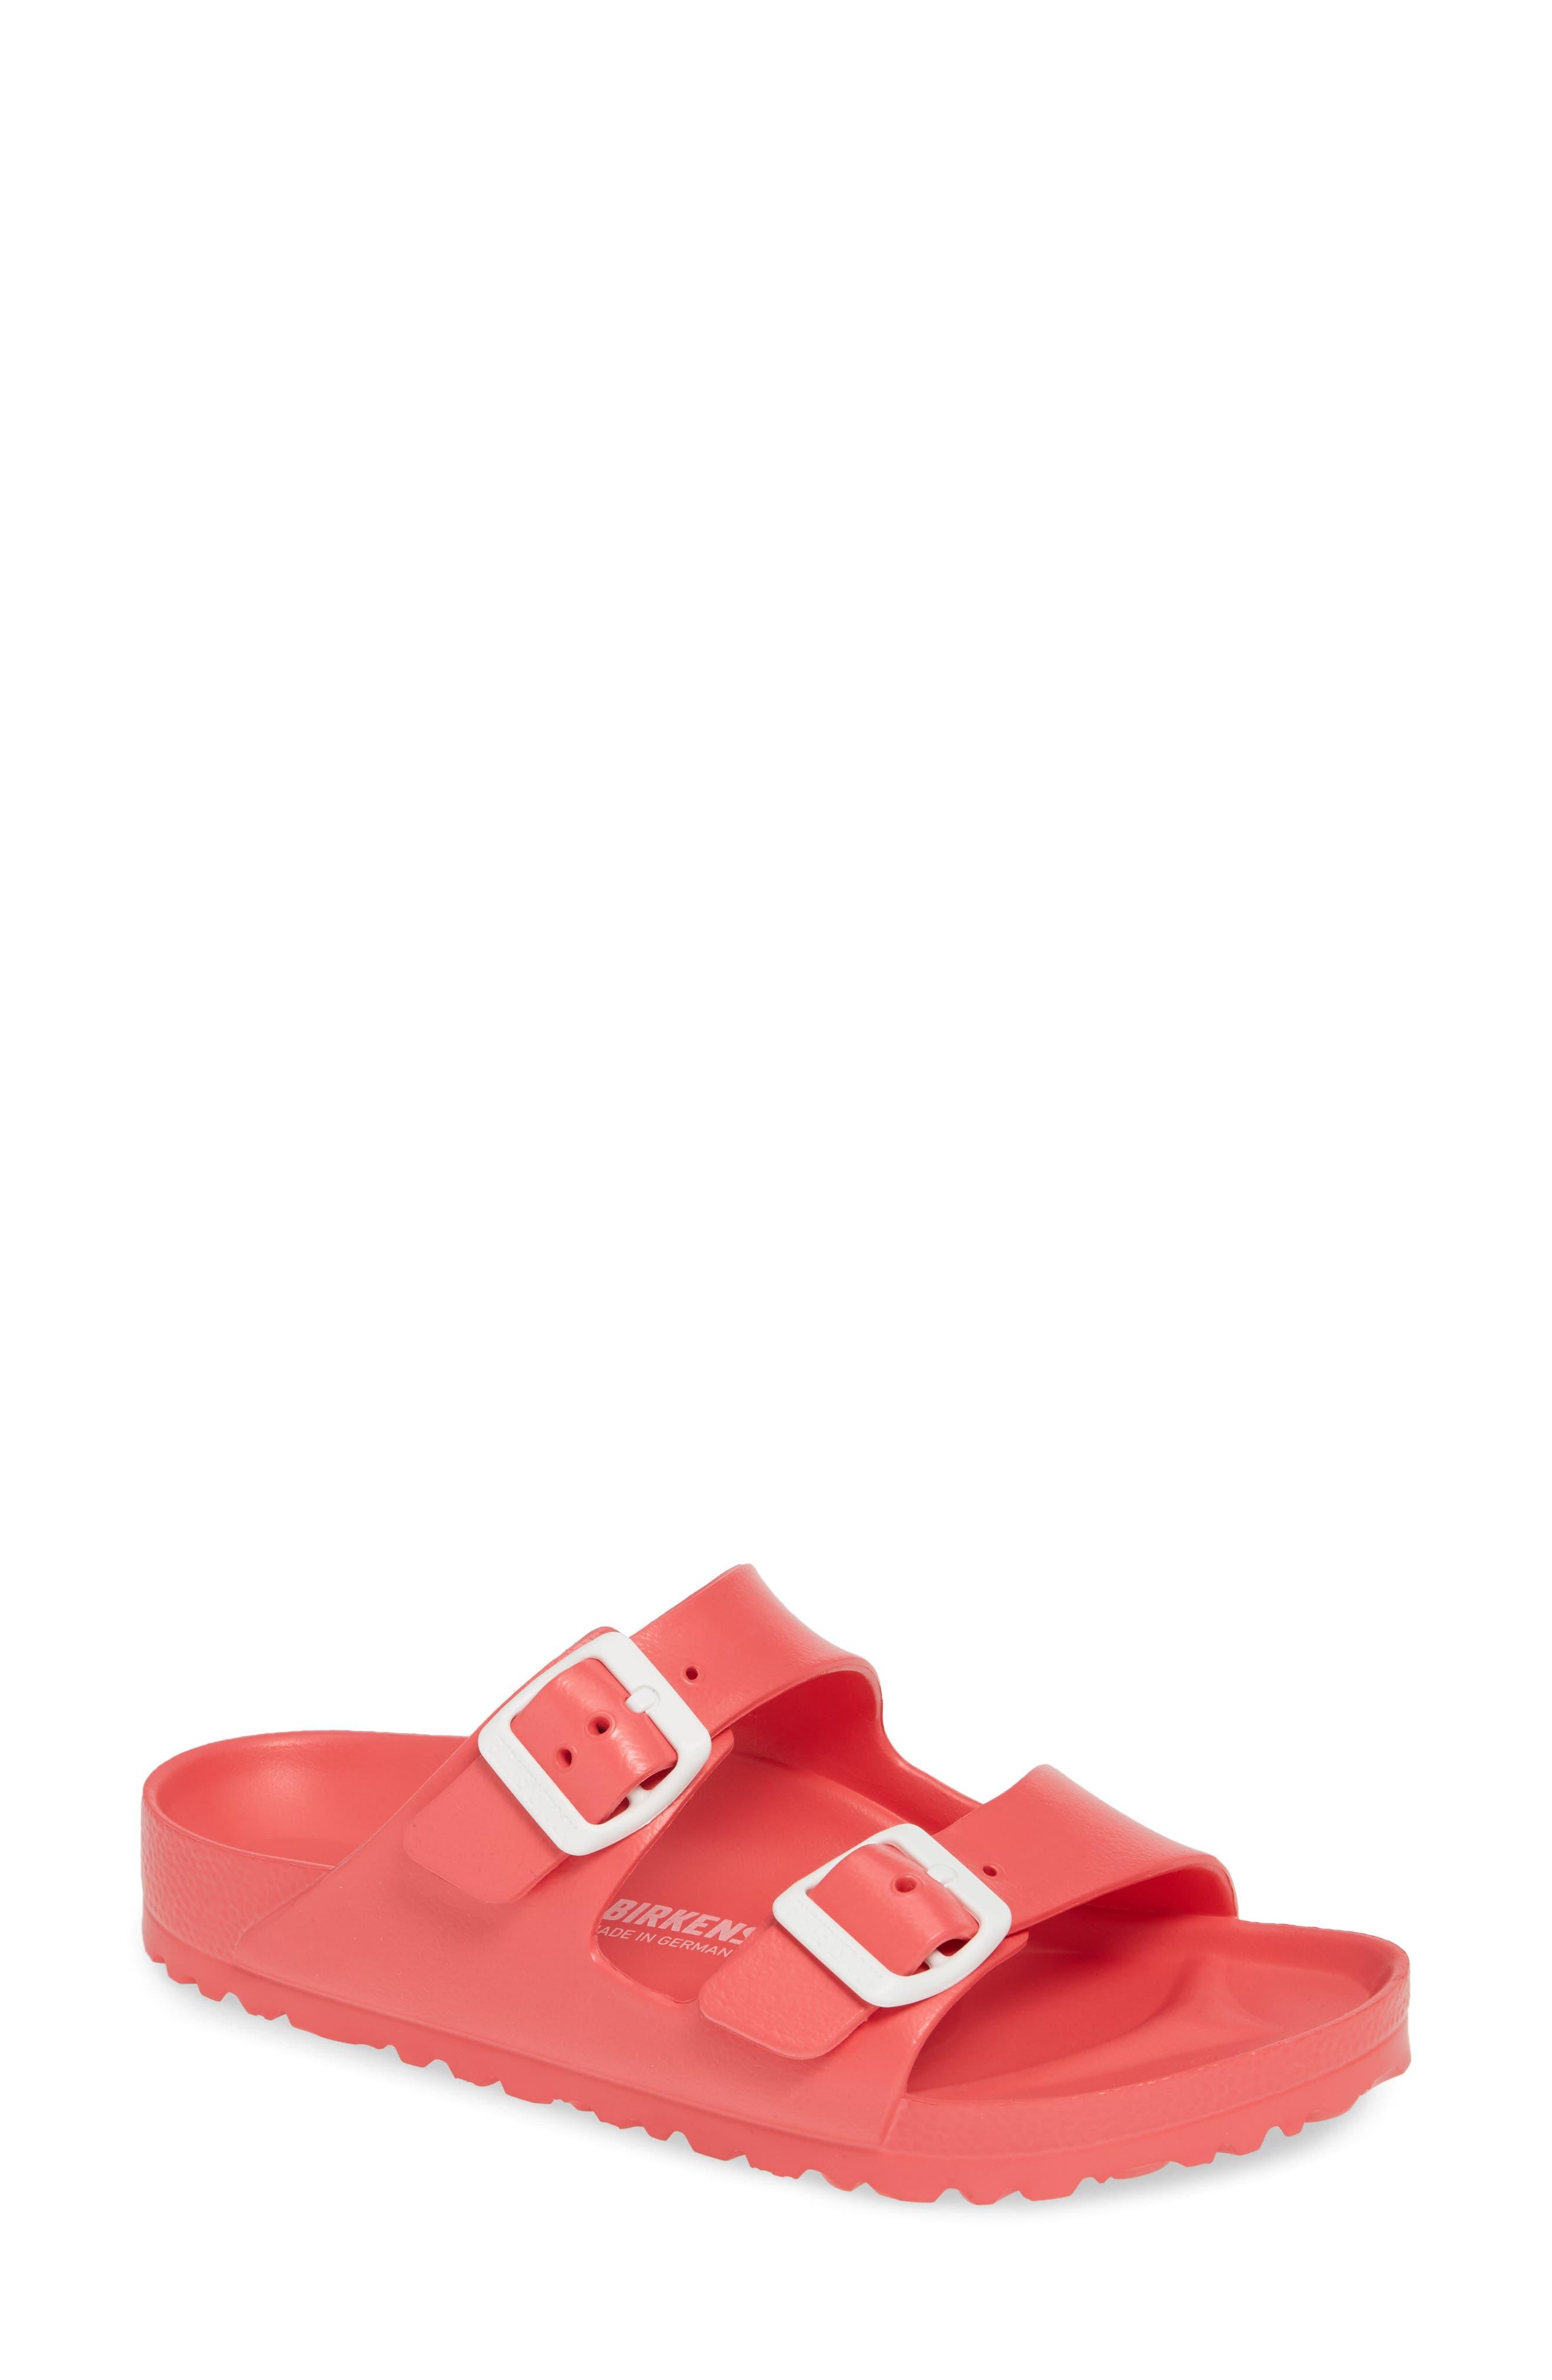 Essentials - Arizona Slide Sandal, Main, color, CORAL EVA